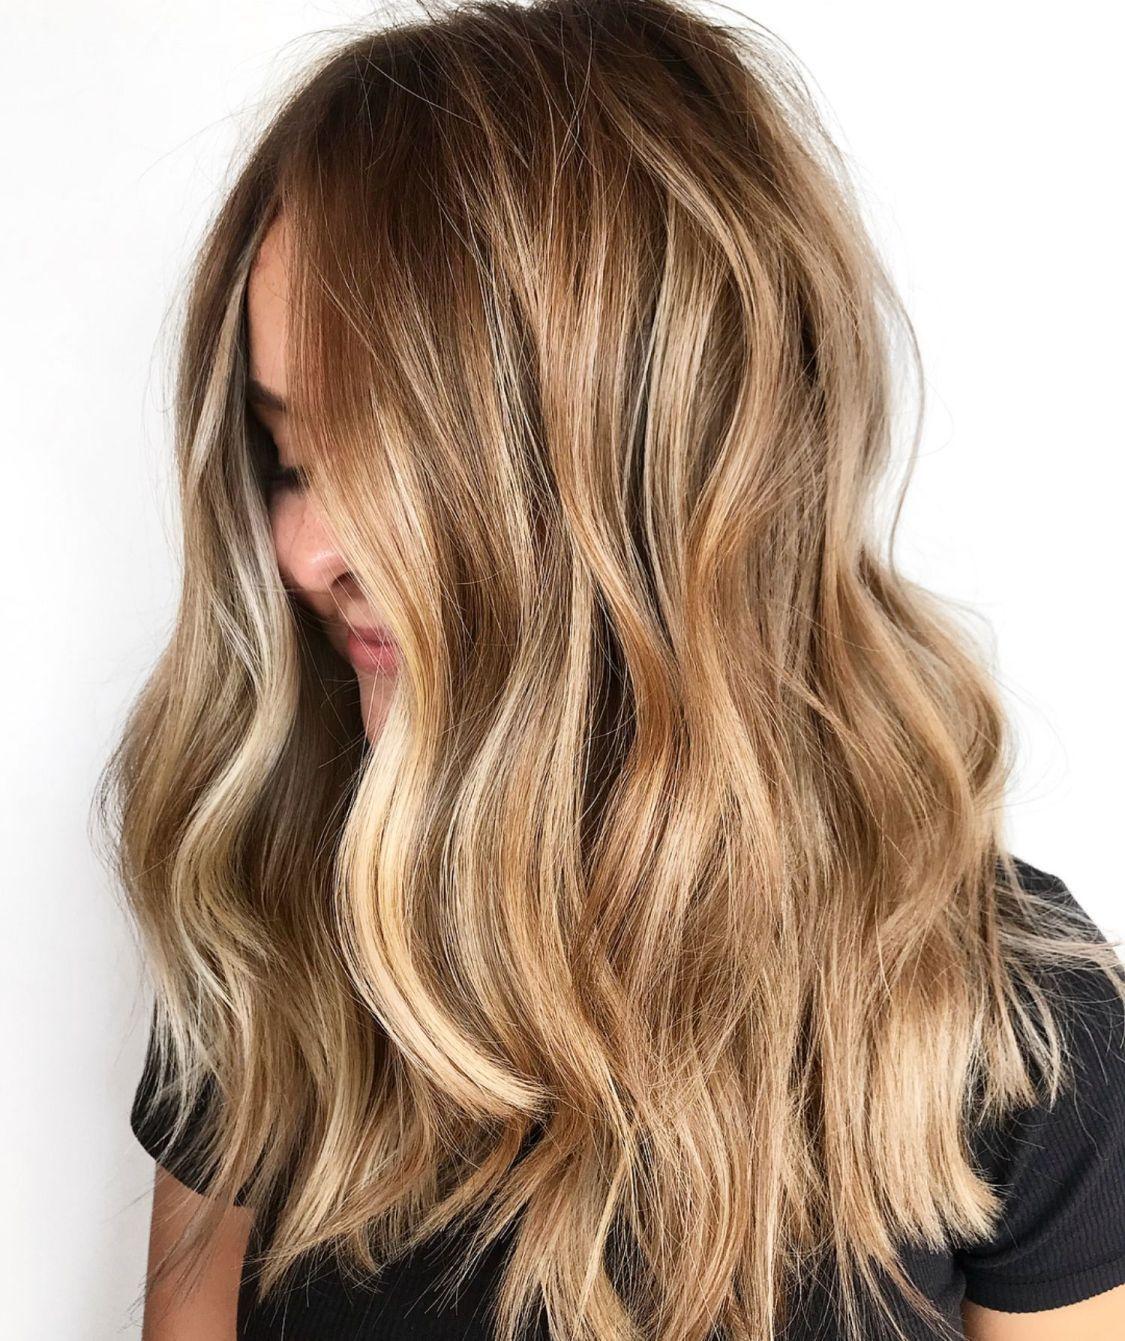 Dark Blonde Hair With Caramel Highlights In 2020 Dark Blonde Hair Blonde Hair Color Brown Hair With Highlights